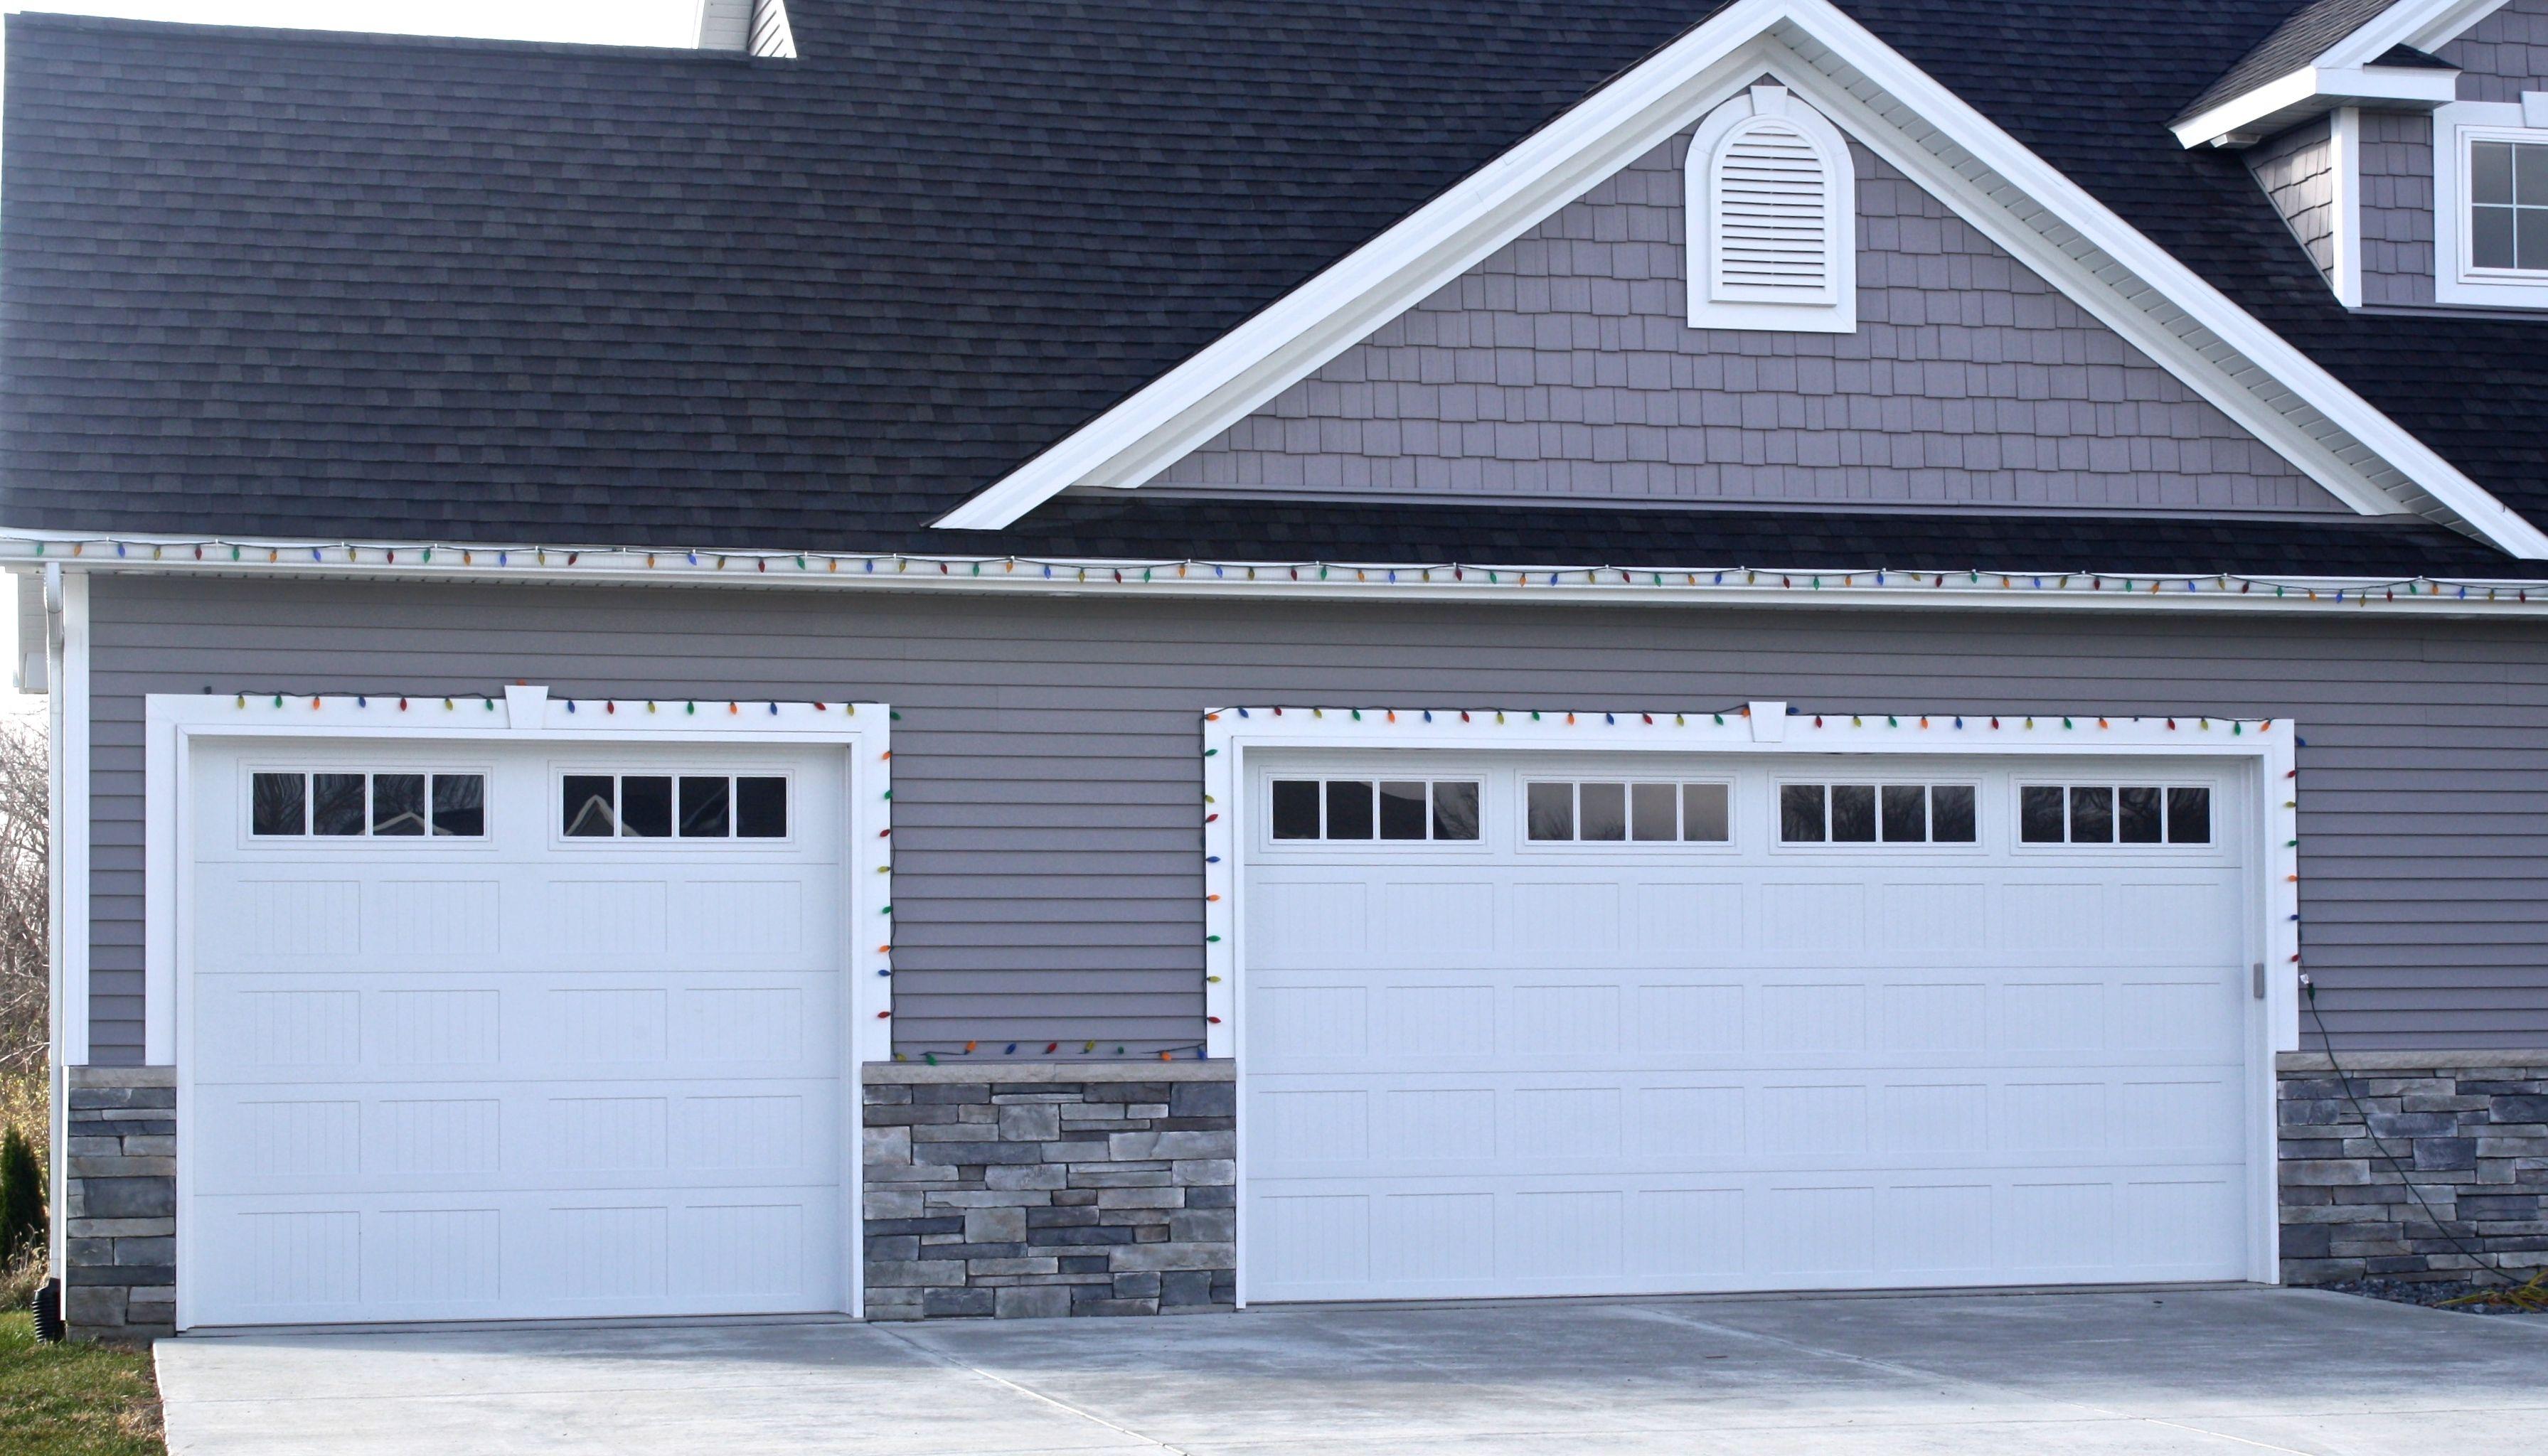 Image Result For White Garage Stone Siding Garage Doors Garage Door Panel Replacement Garage Door Windows